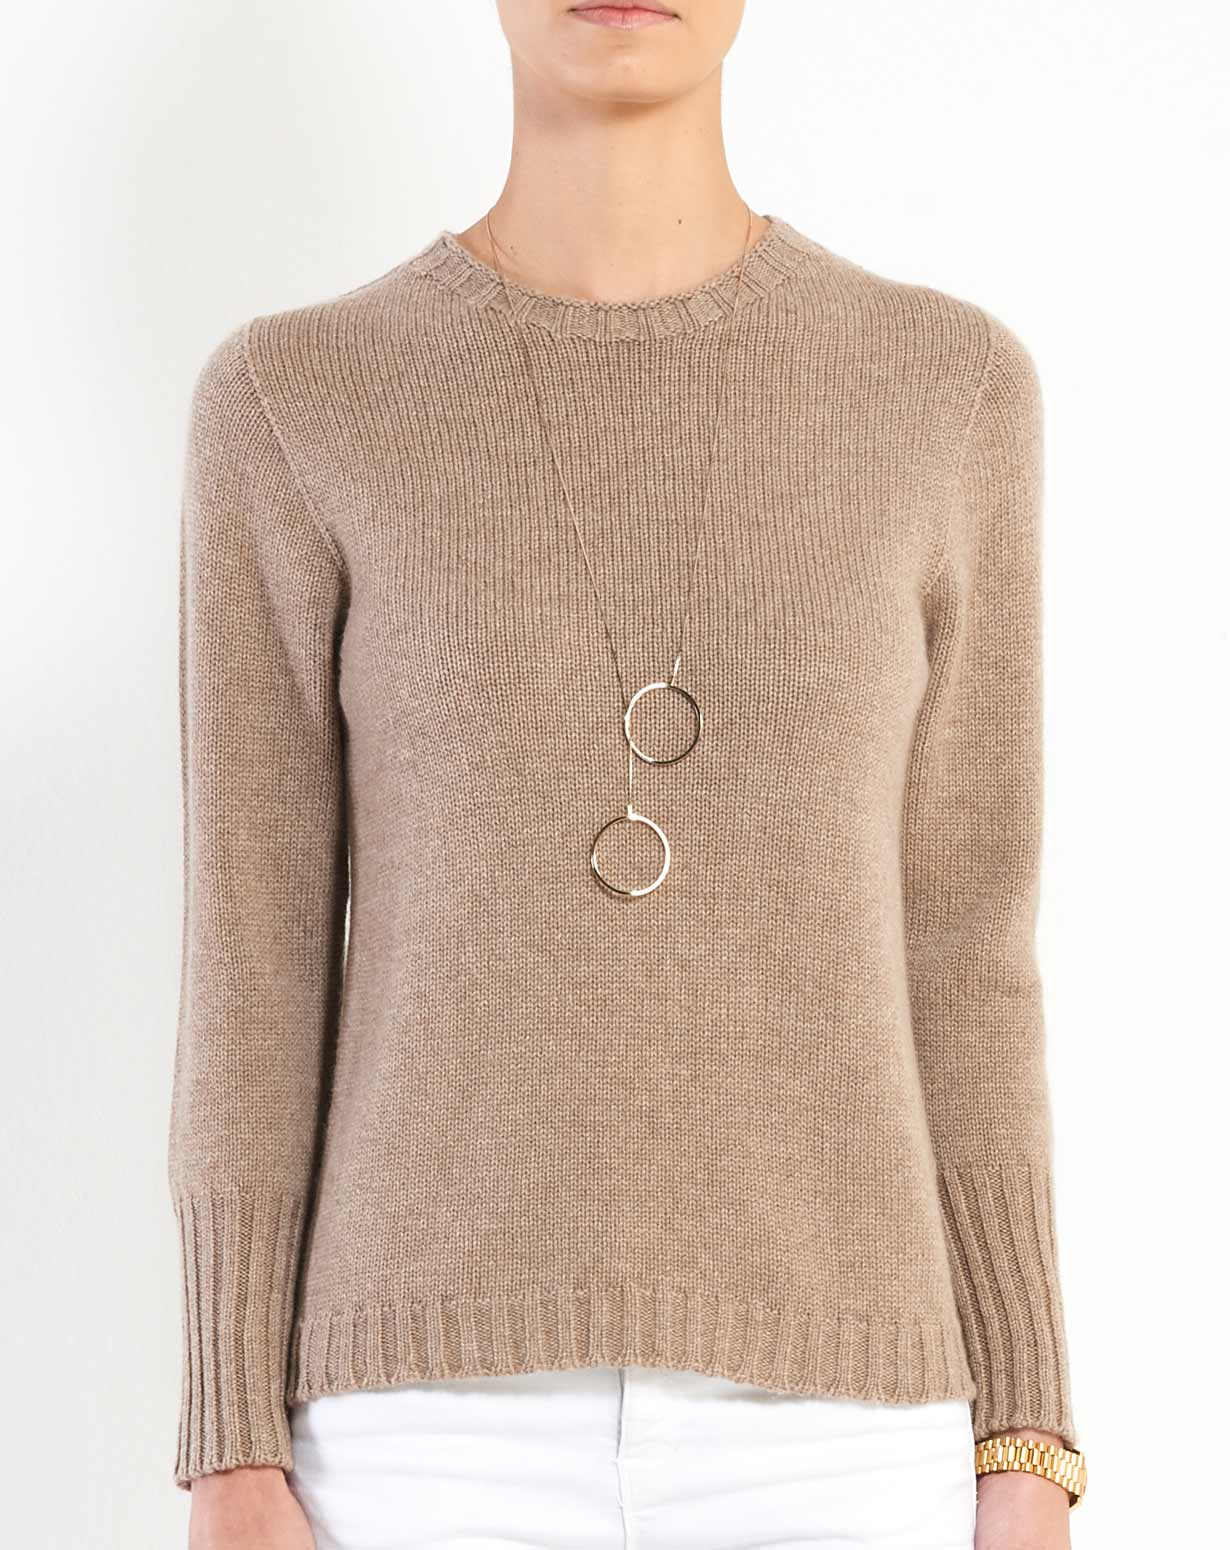 Women's Pure Cashmere Crew Neck Sweater